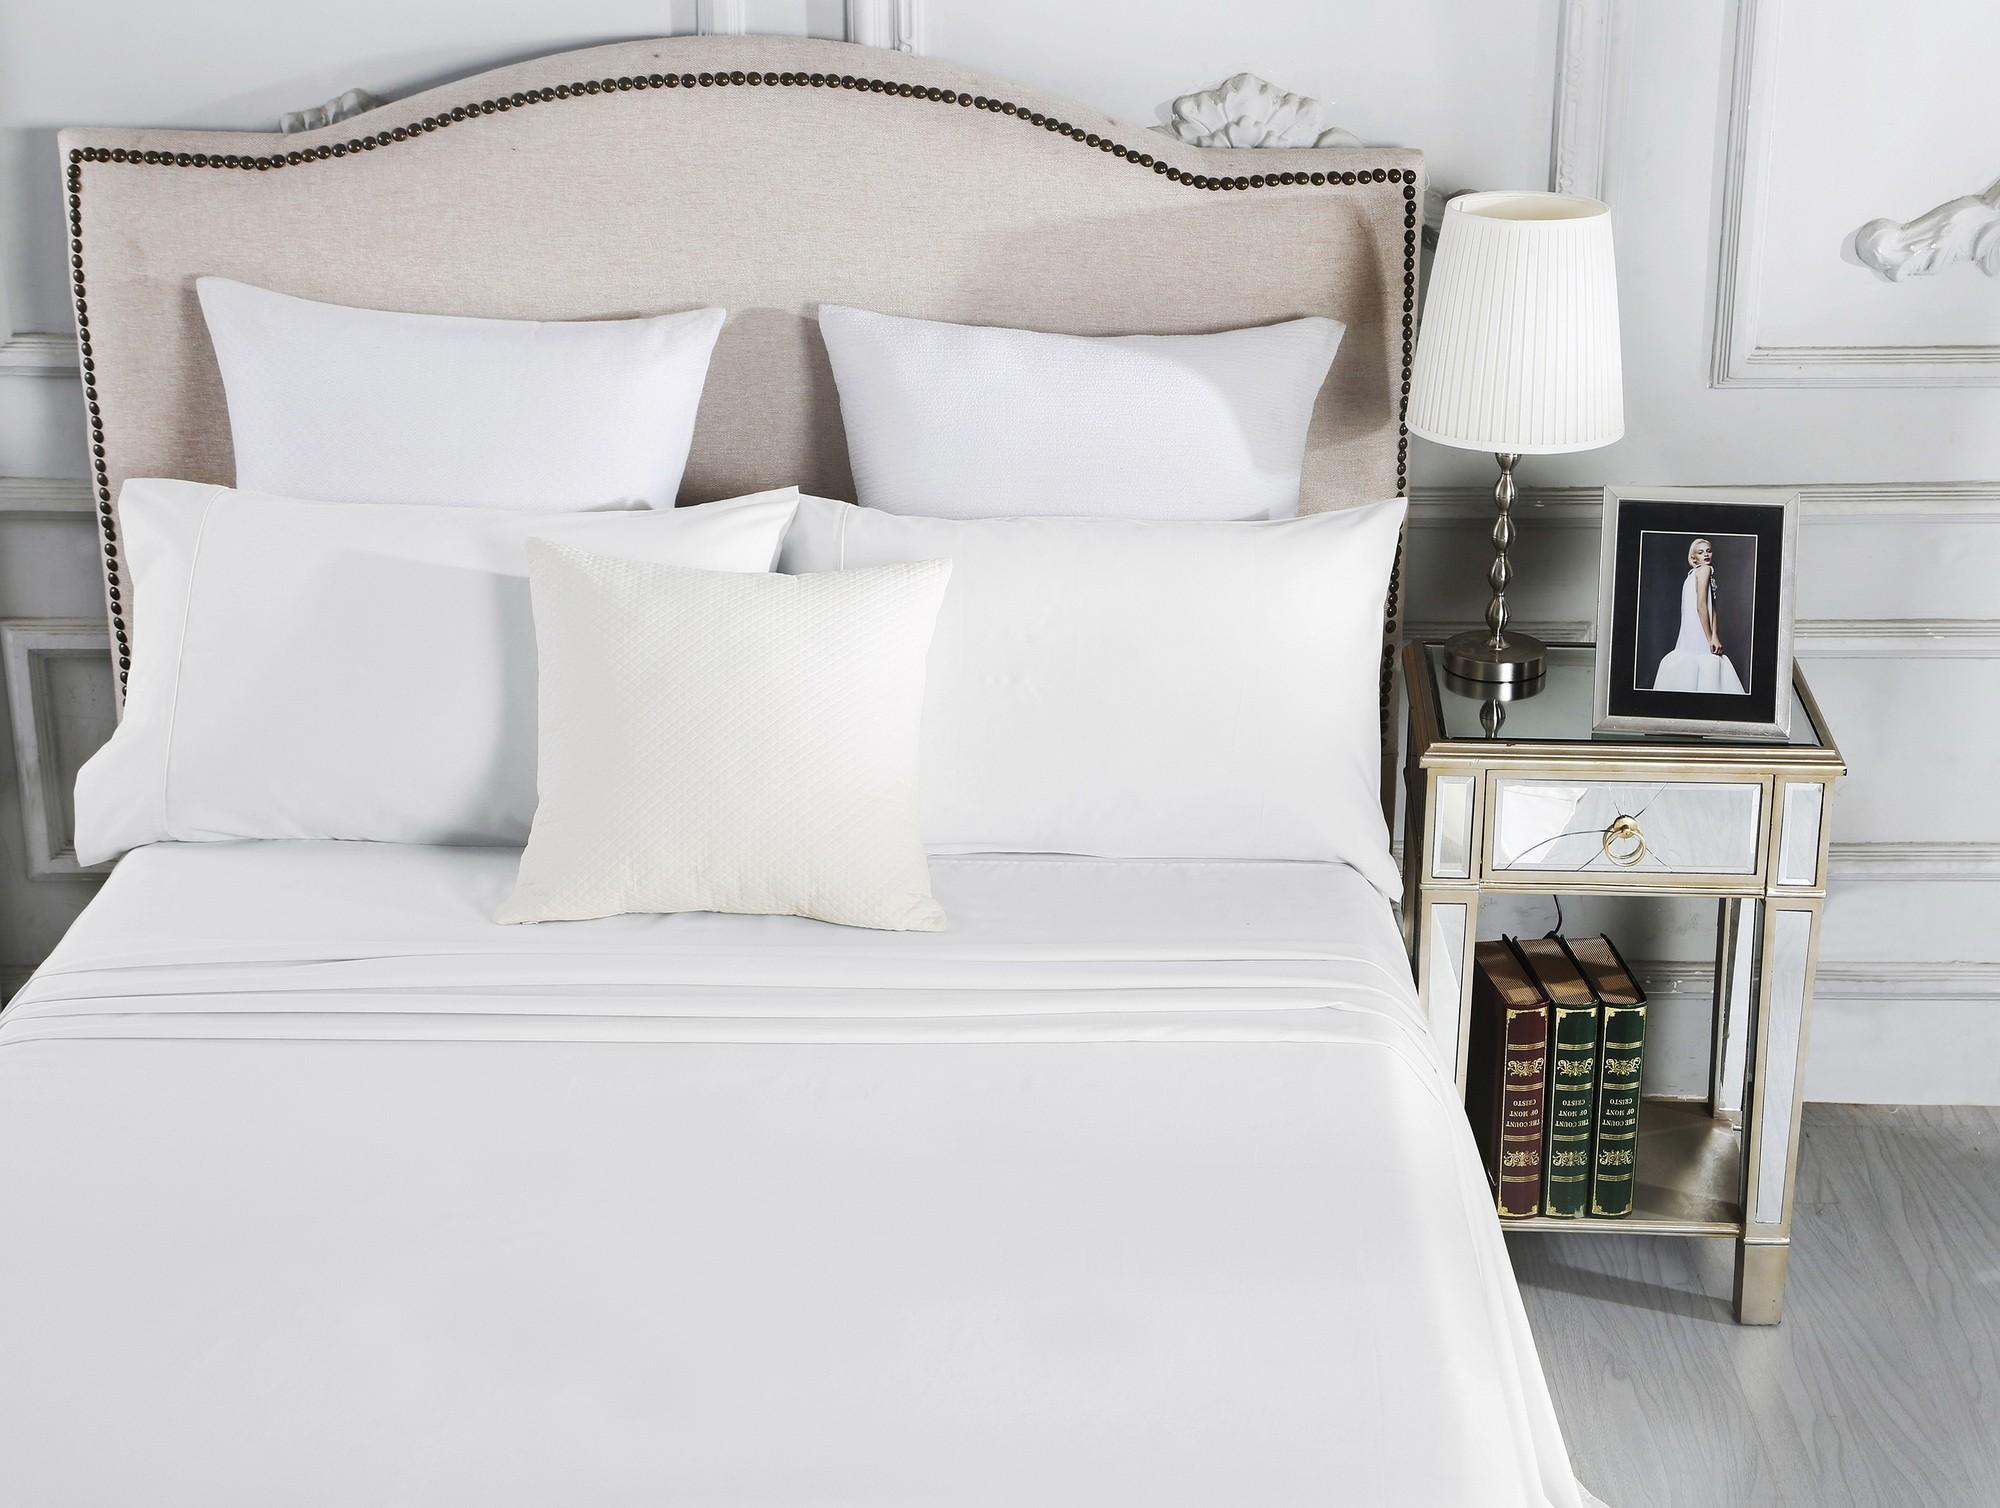 Luxury 1800TC Cotton Rich Queen Sheet Sets White